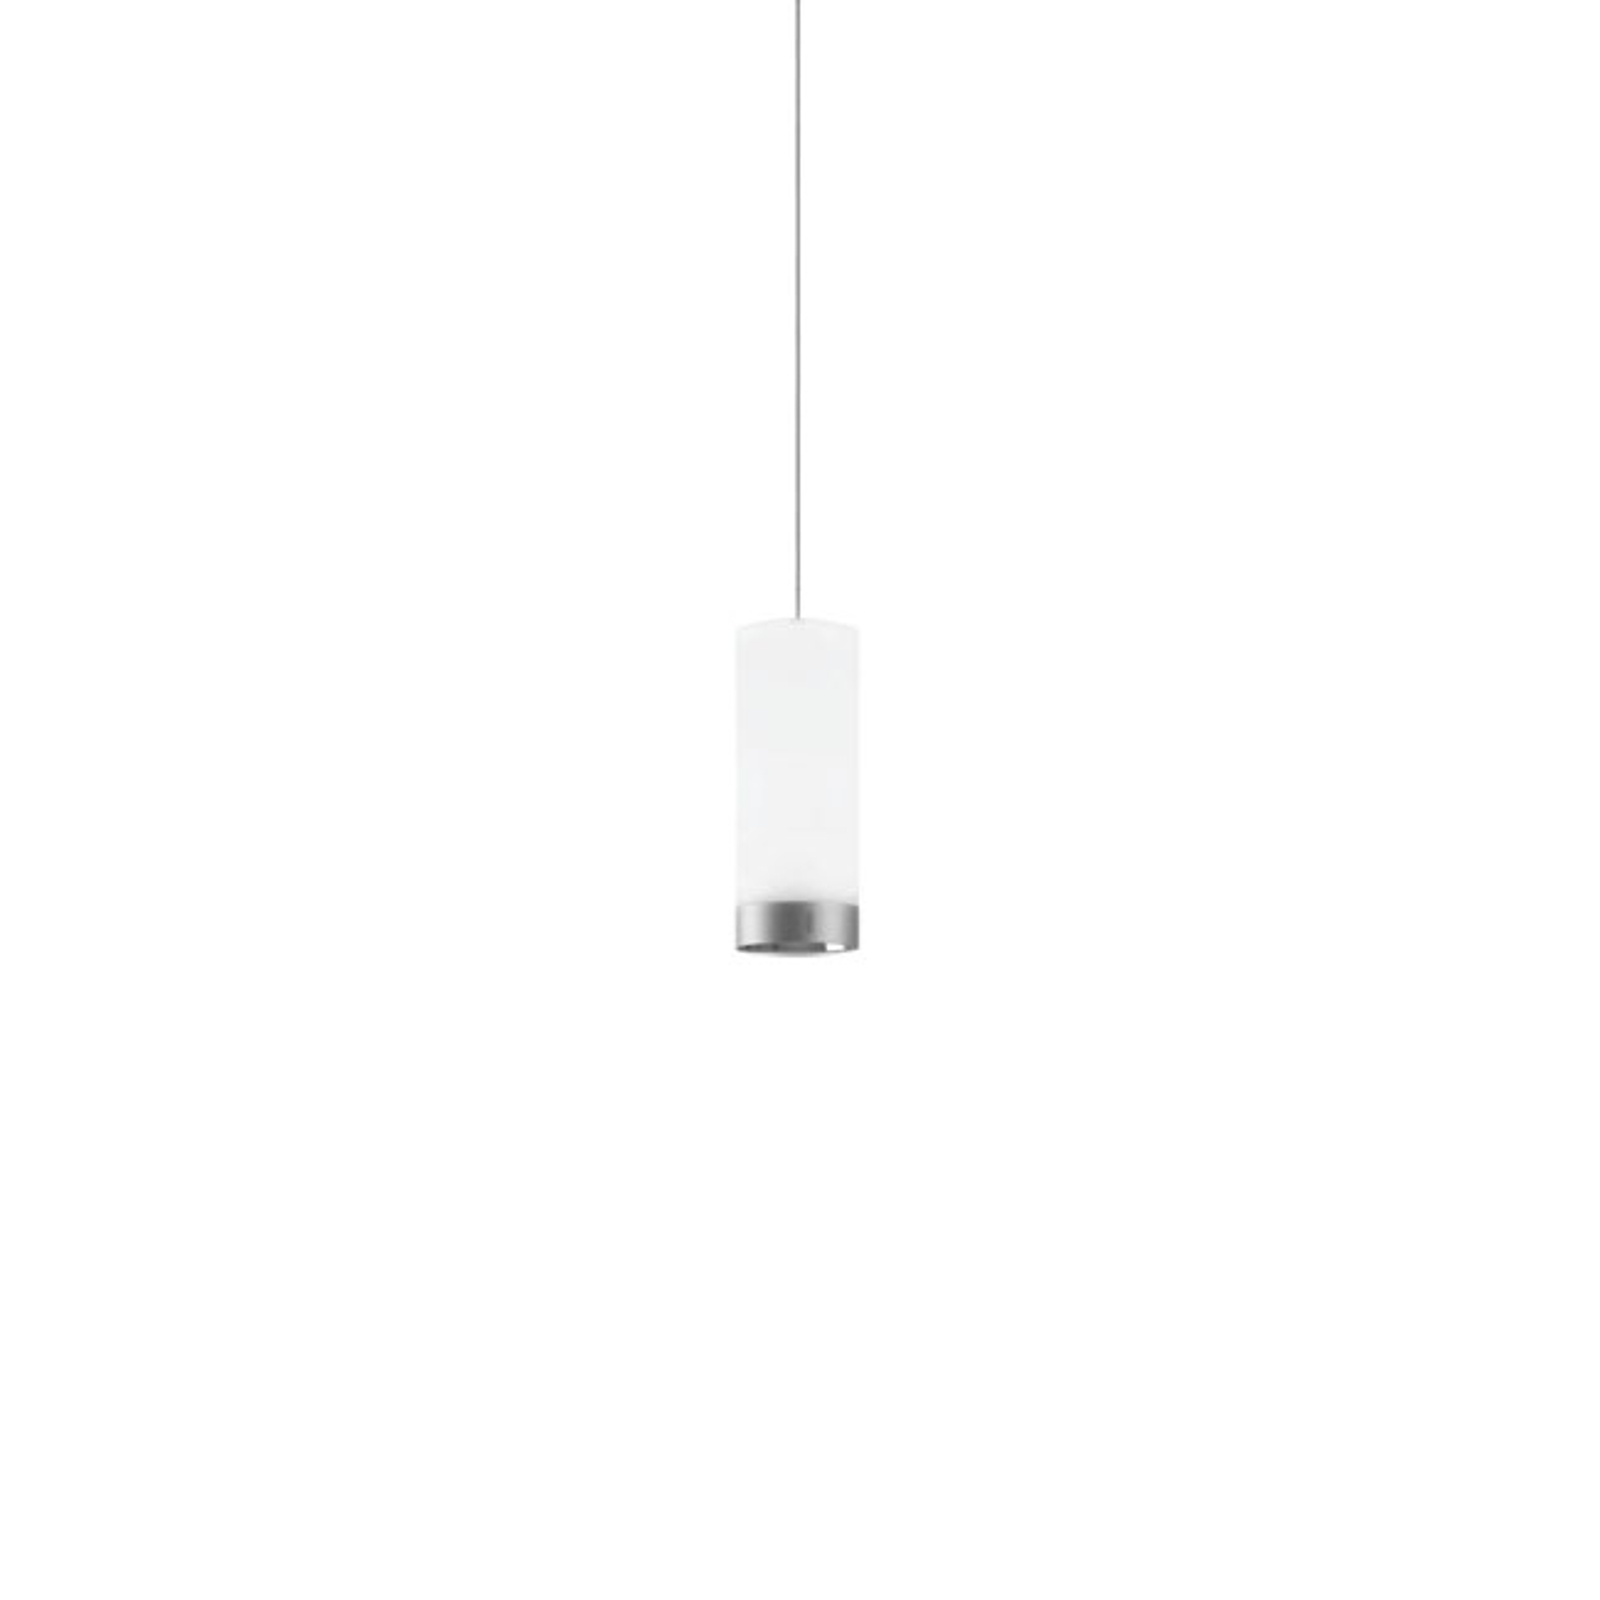 Lampa wisząca LED A20-P166, DALI, 40 cm, 3000K